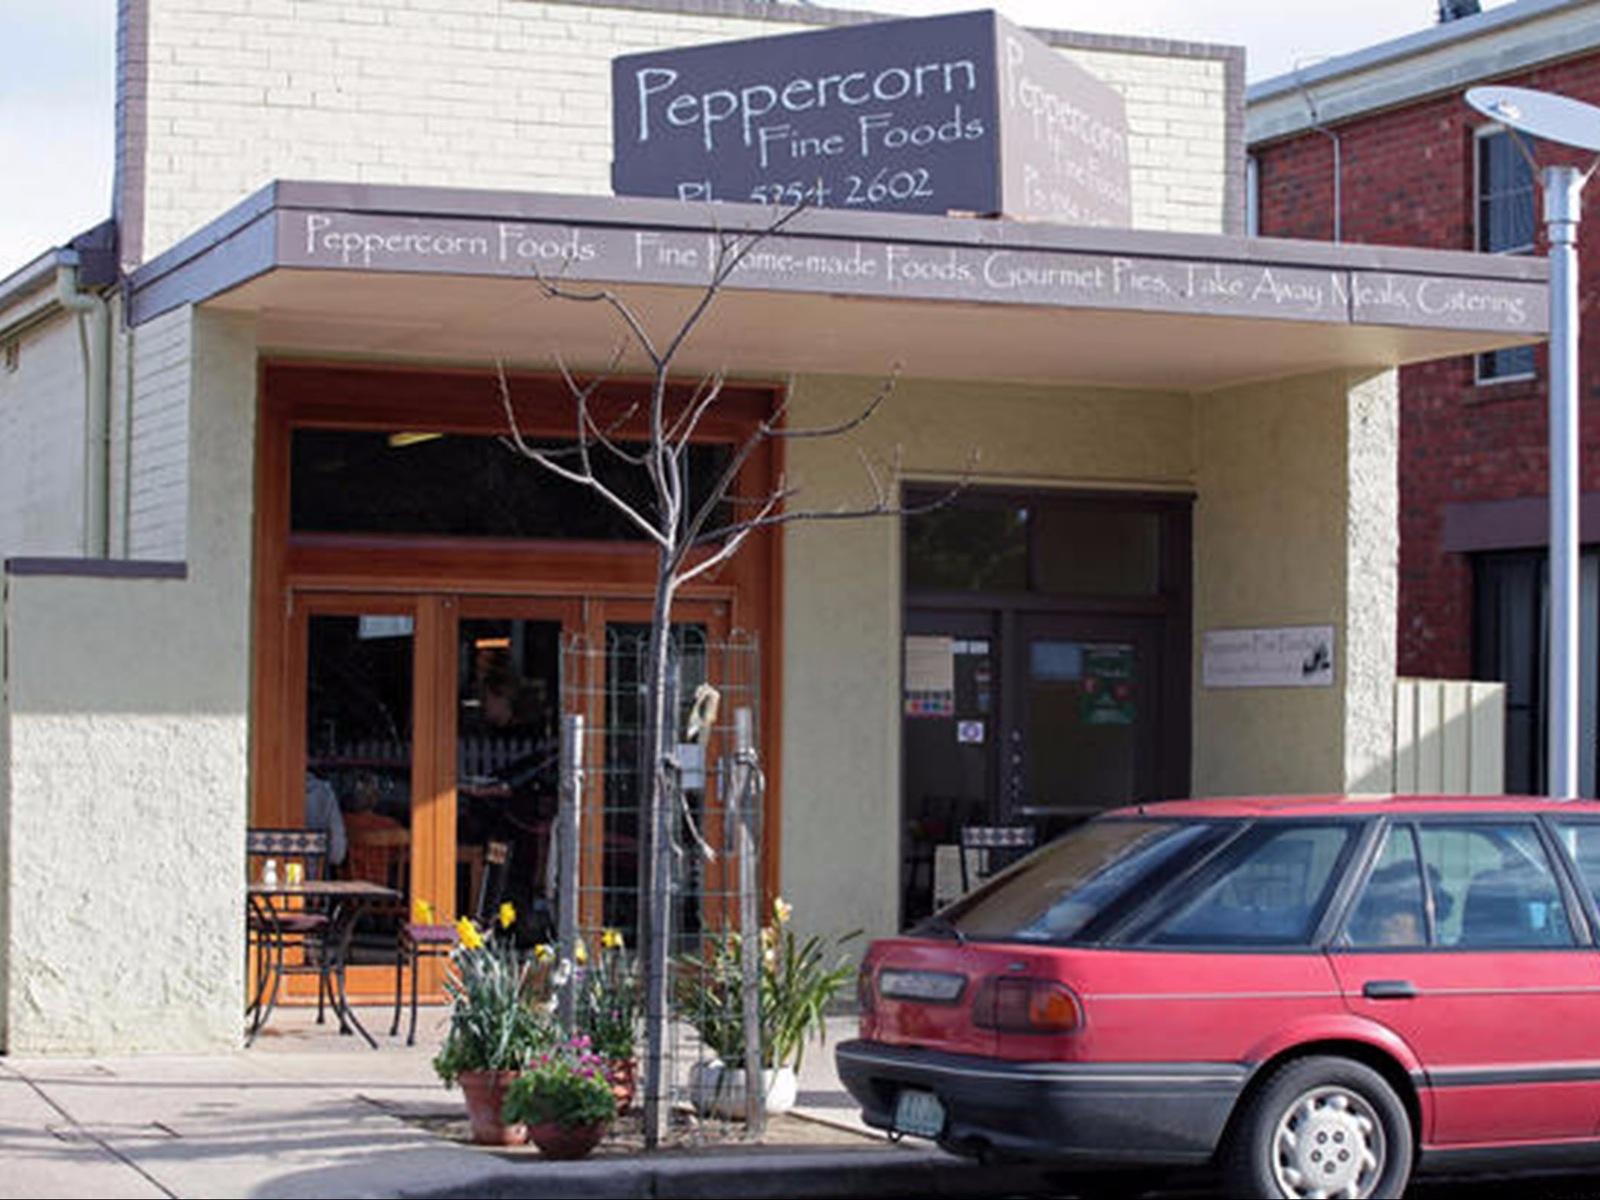 Peppercorn Foods